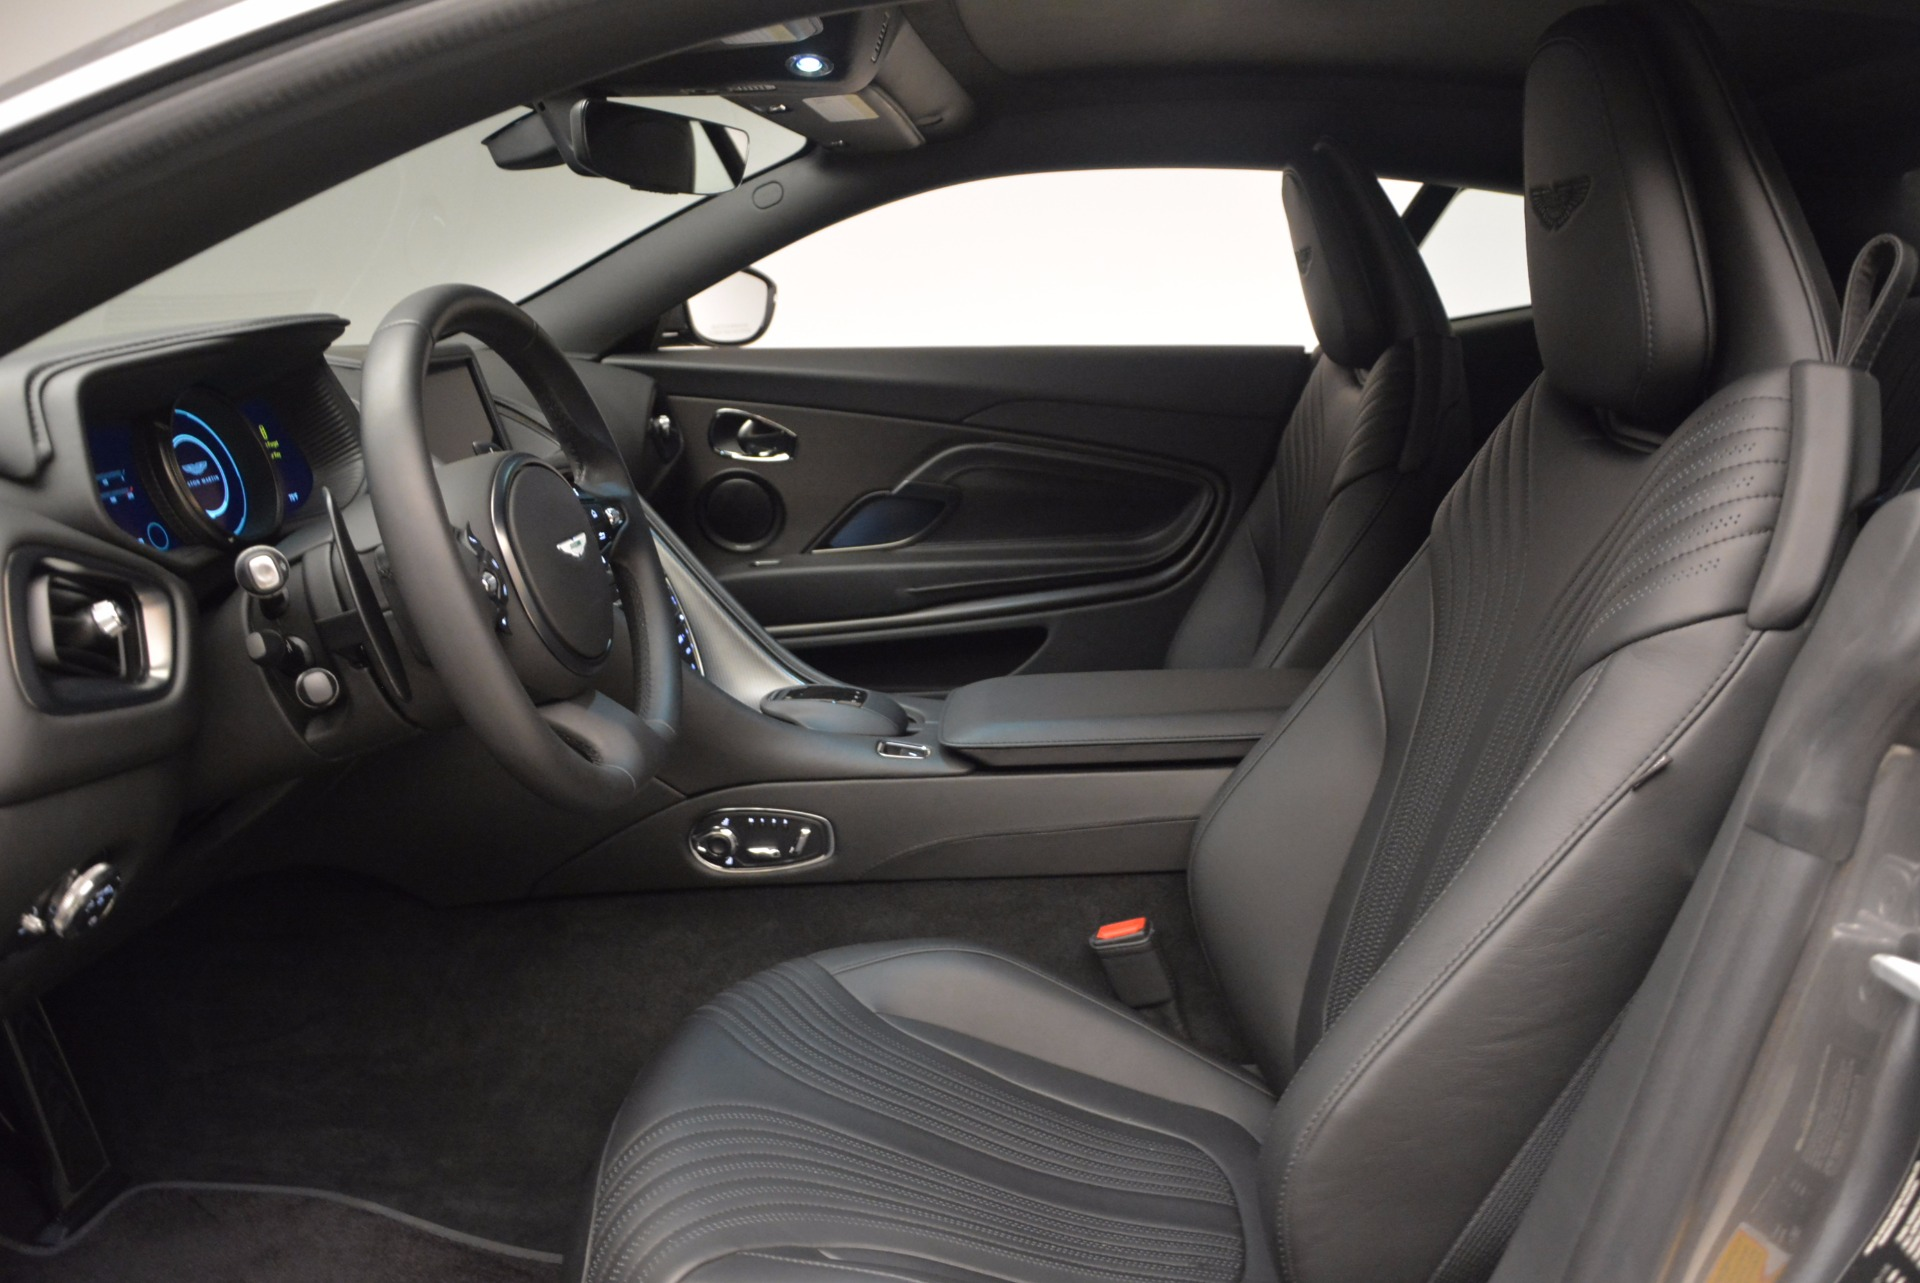 Used 2017 Aston Martin DB11  For Sale In Greenwich, CT. Alfa Romeo of Greenwich, 7267 1496_p13